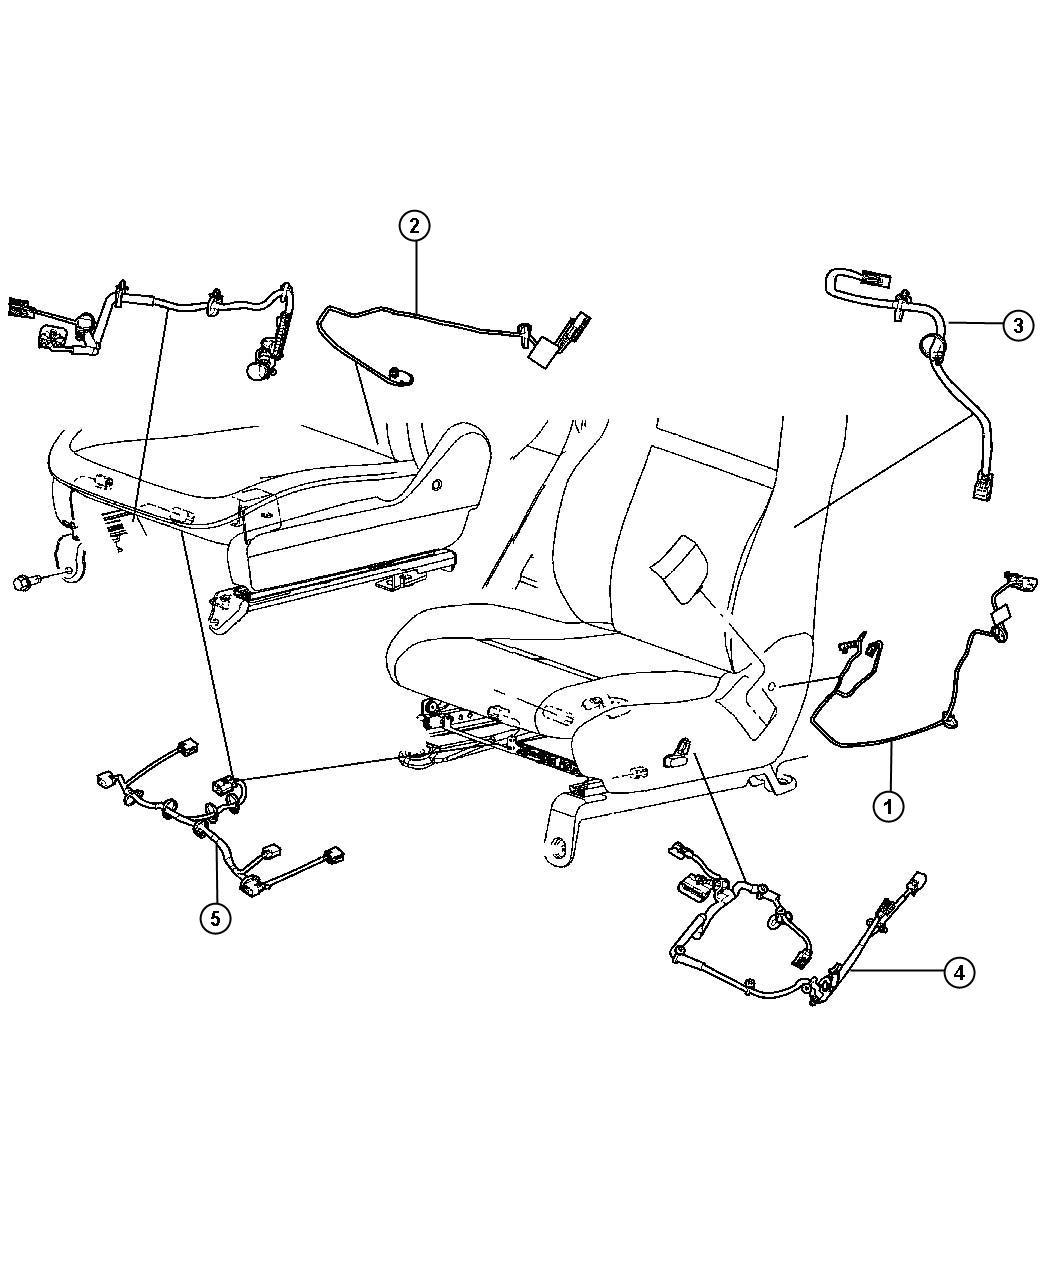 Dodge Durango Wiring. Power seat. Trim: [leather trimmed